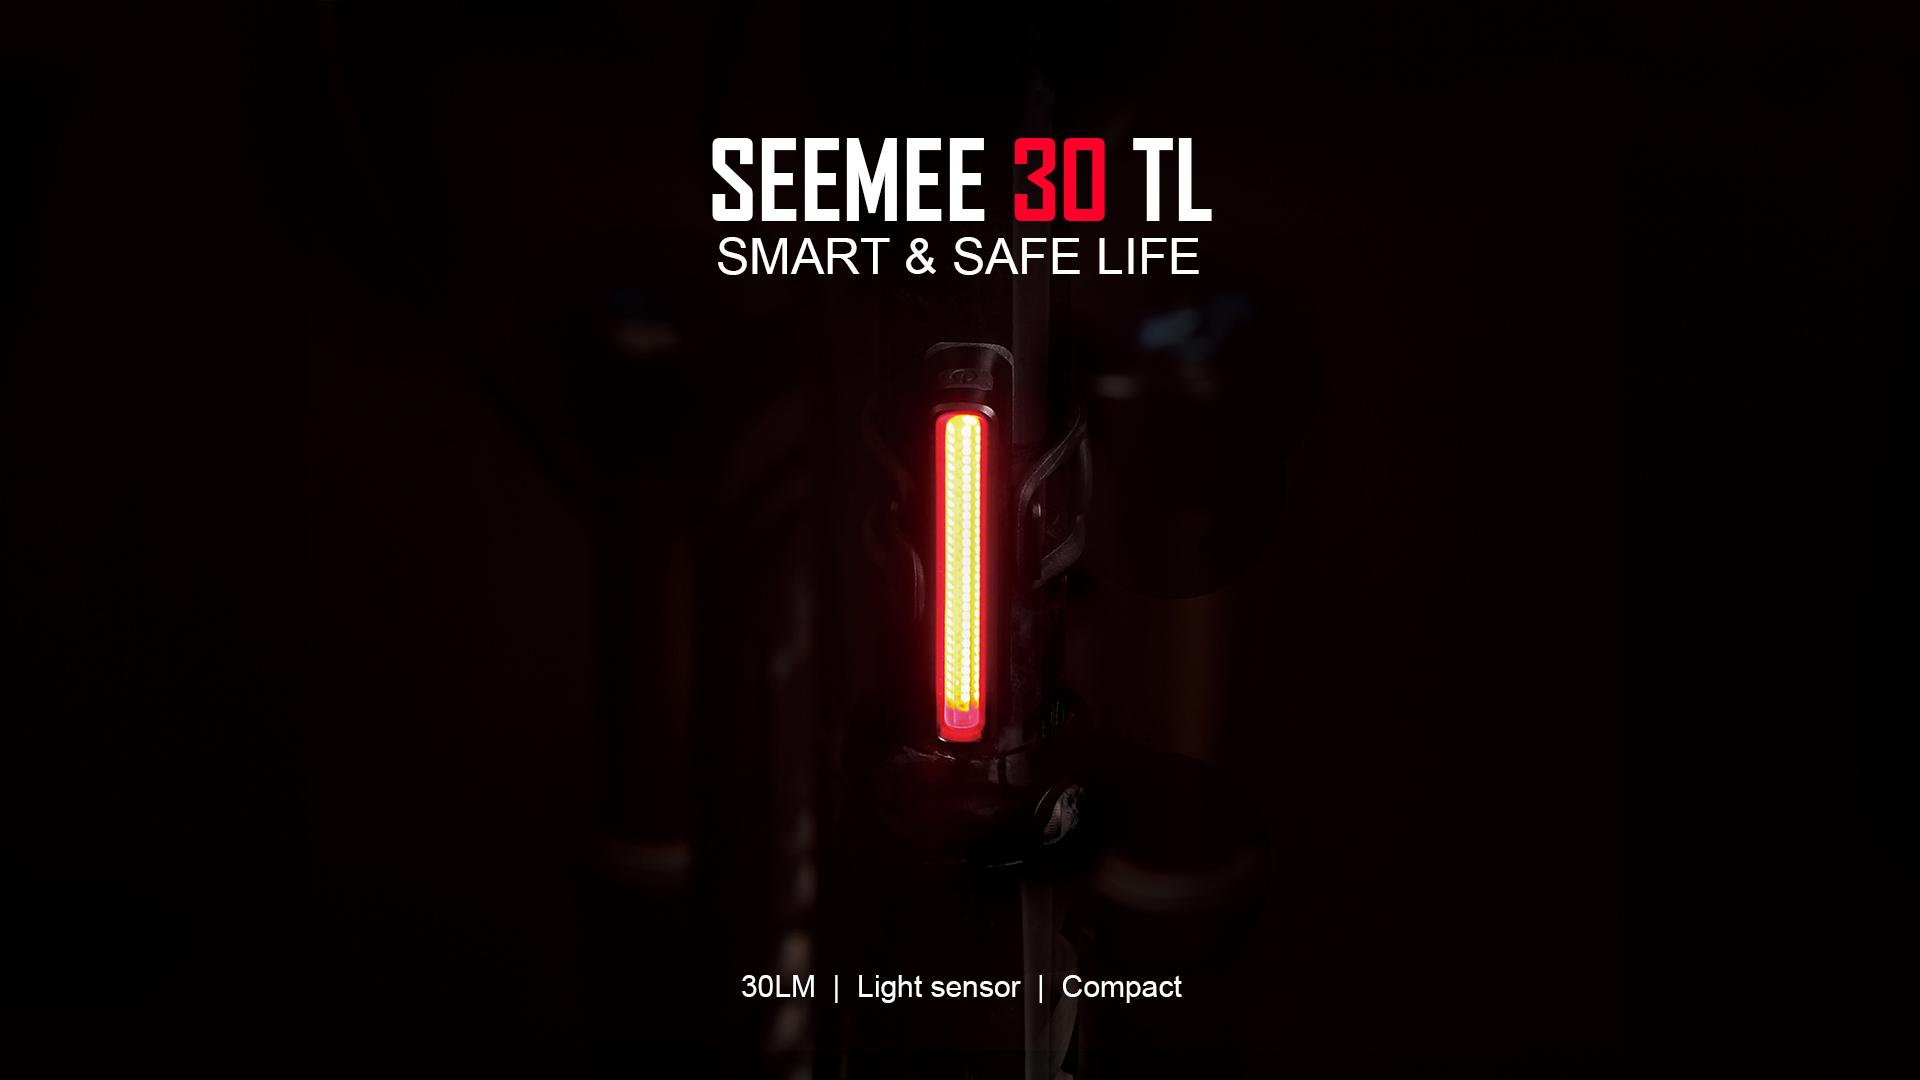 Seemee 30 TL Rear Bike Light 30 Lumens